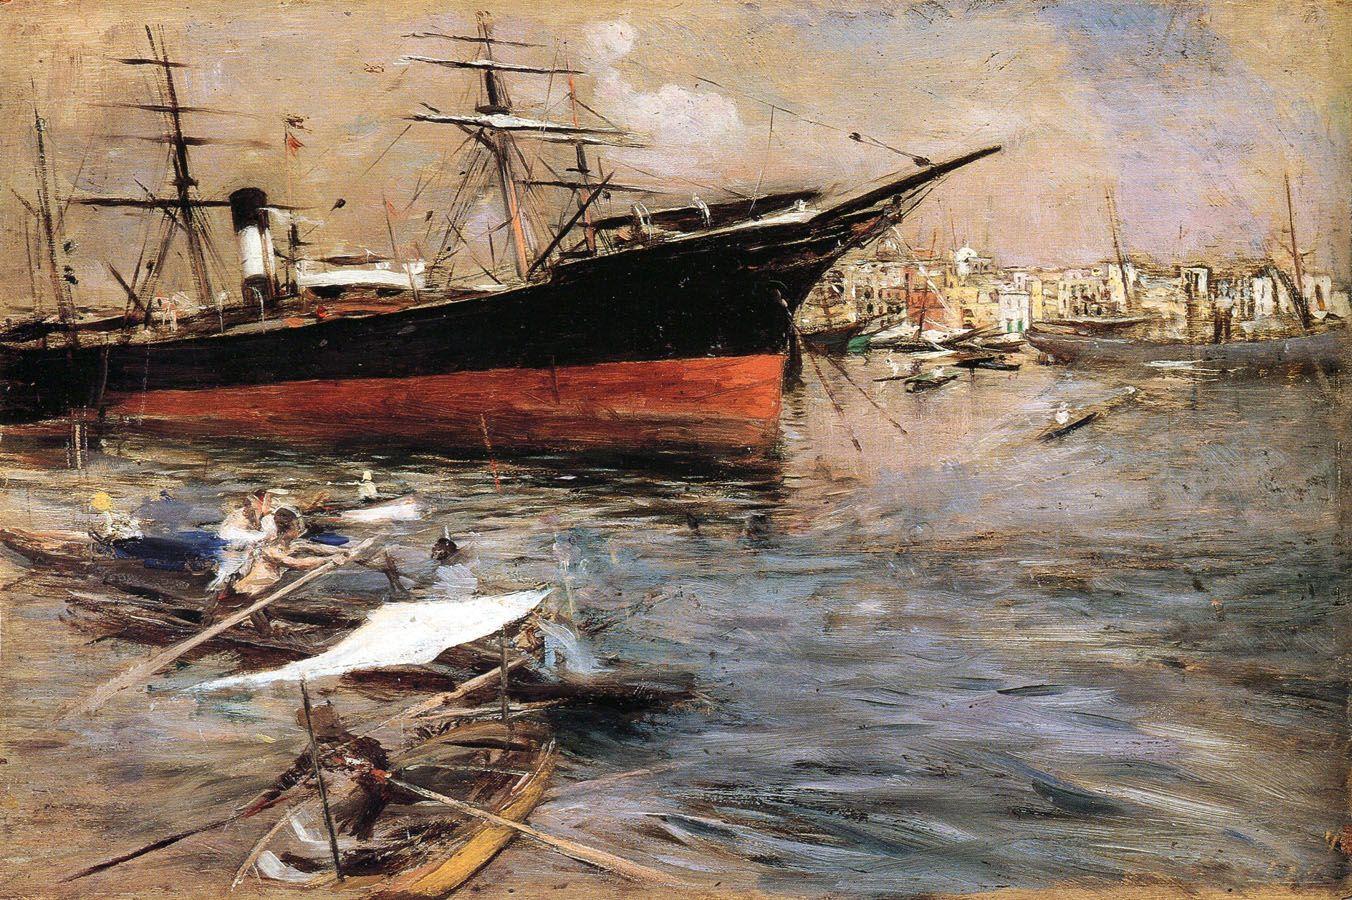 Giovanni Boldini (1842 - 1931) | Giovanni boldini, Giovanni, Painting